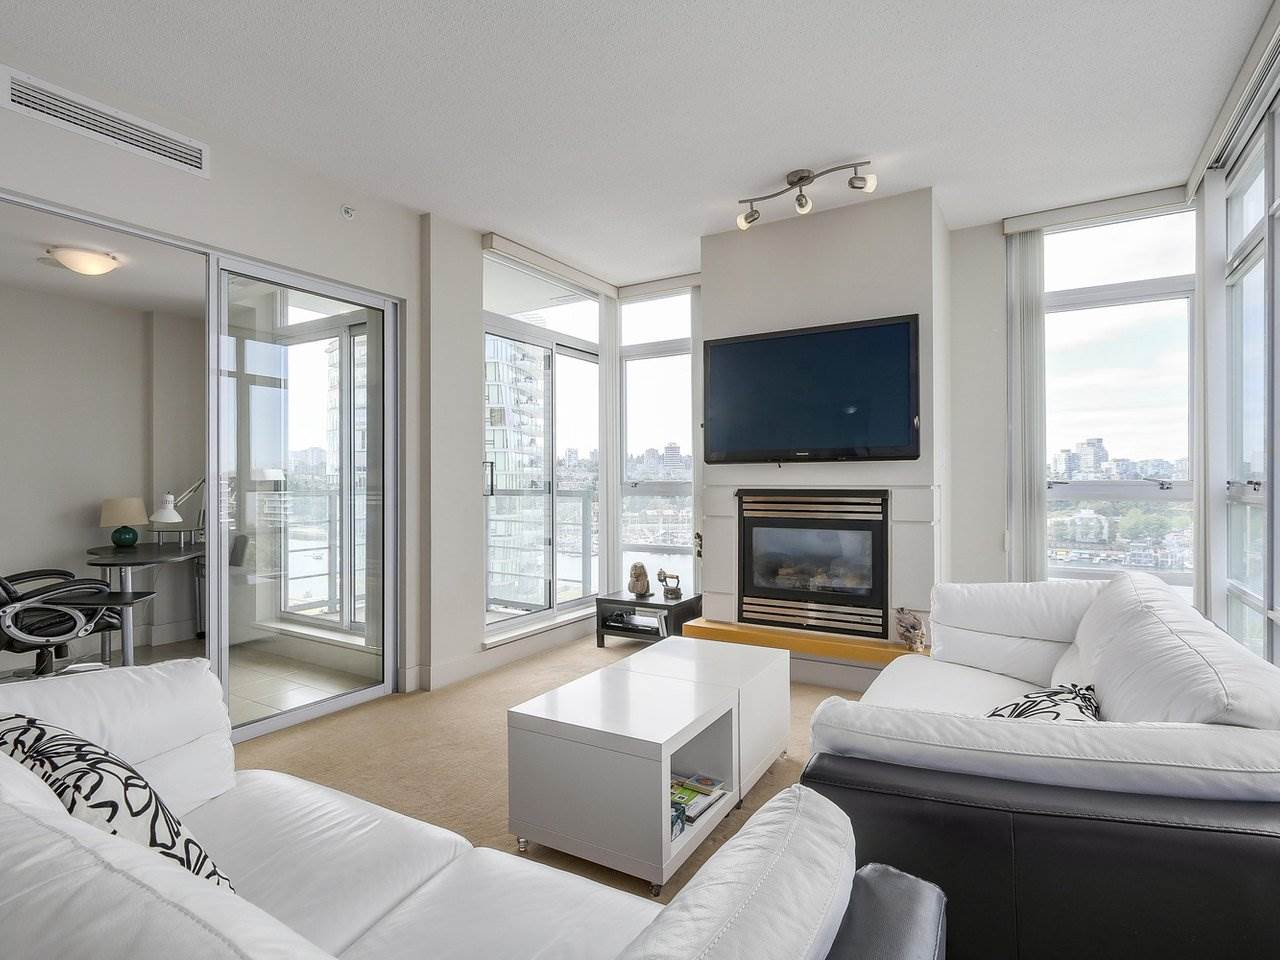 Condo Apartment at 1106 1483 HOMER STREET, Unit 1106, Vancouver West, British Columbia. Image 5